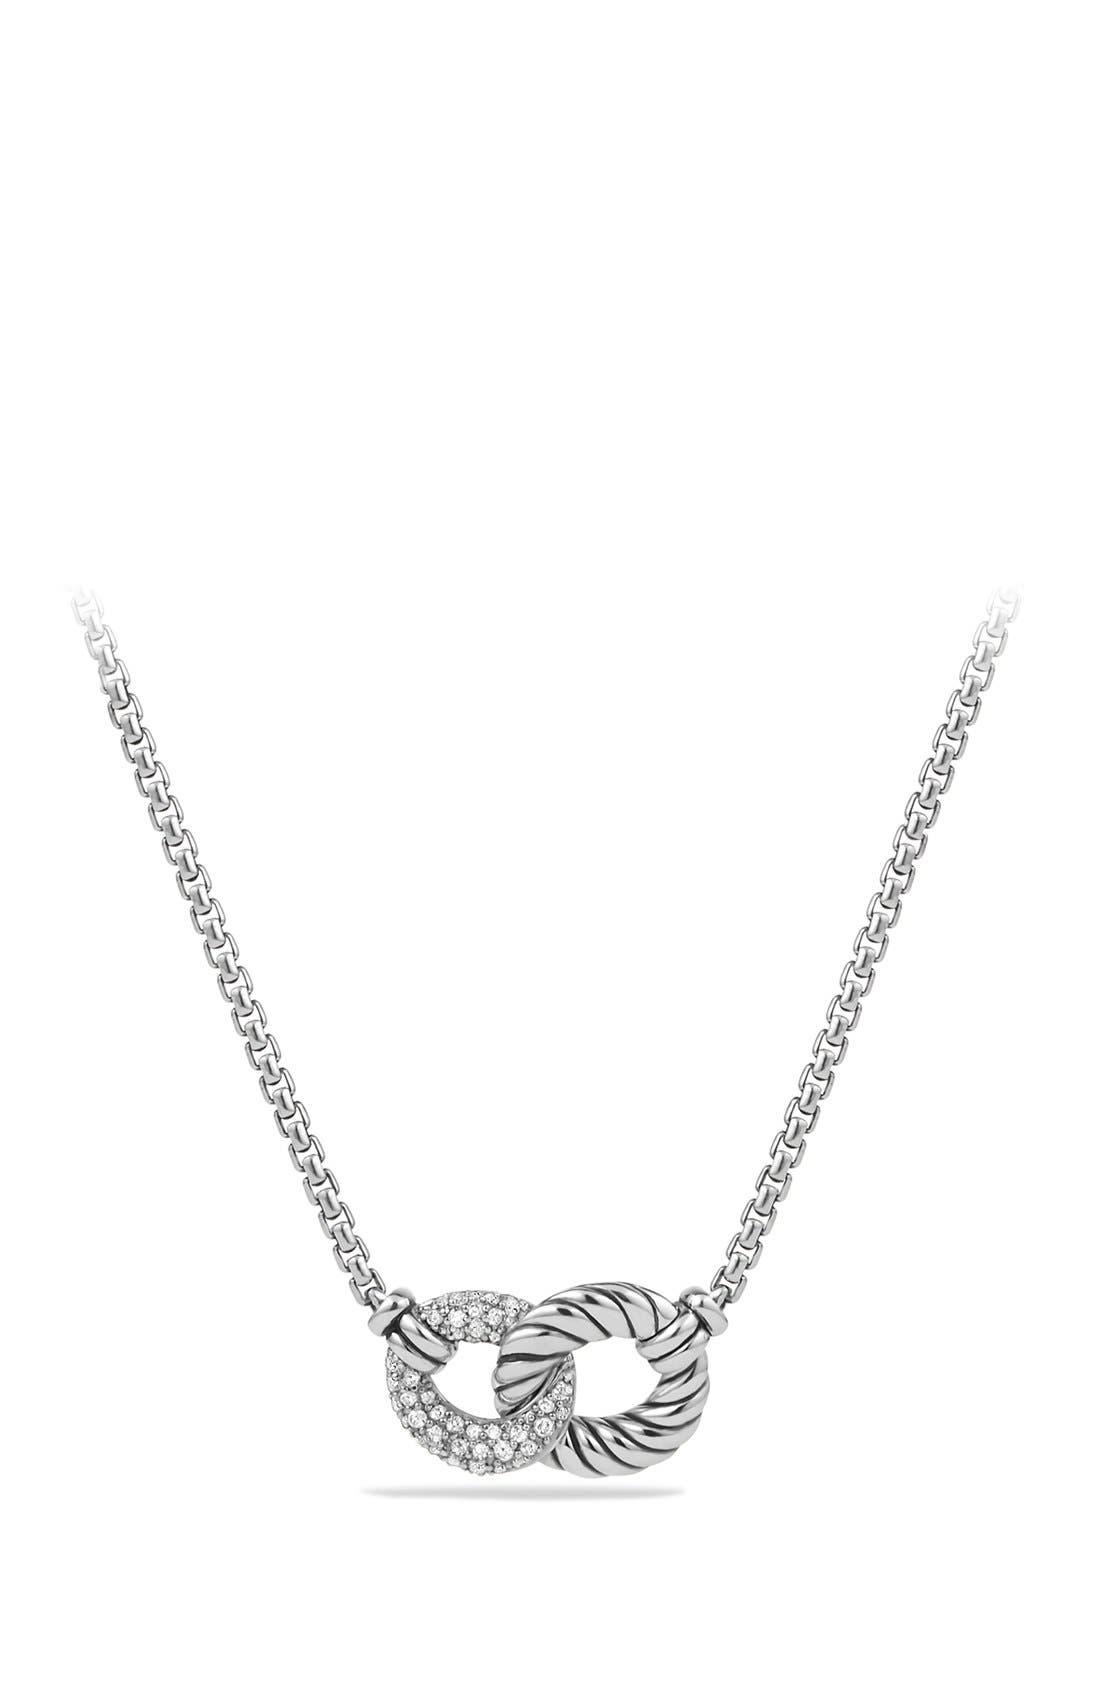 'Belmont' Necklace with Diamonds,                             Main thumbnail 1, color,                             DIAMOND